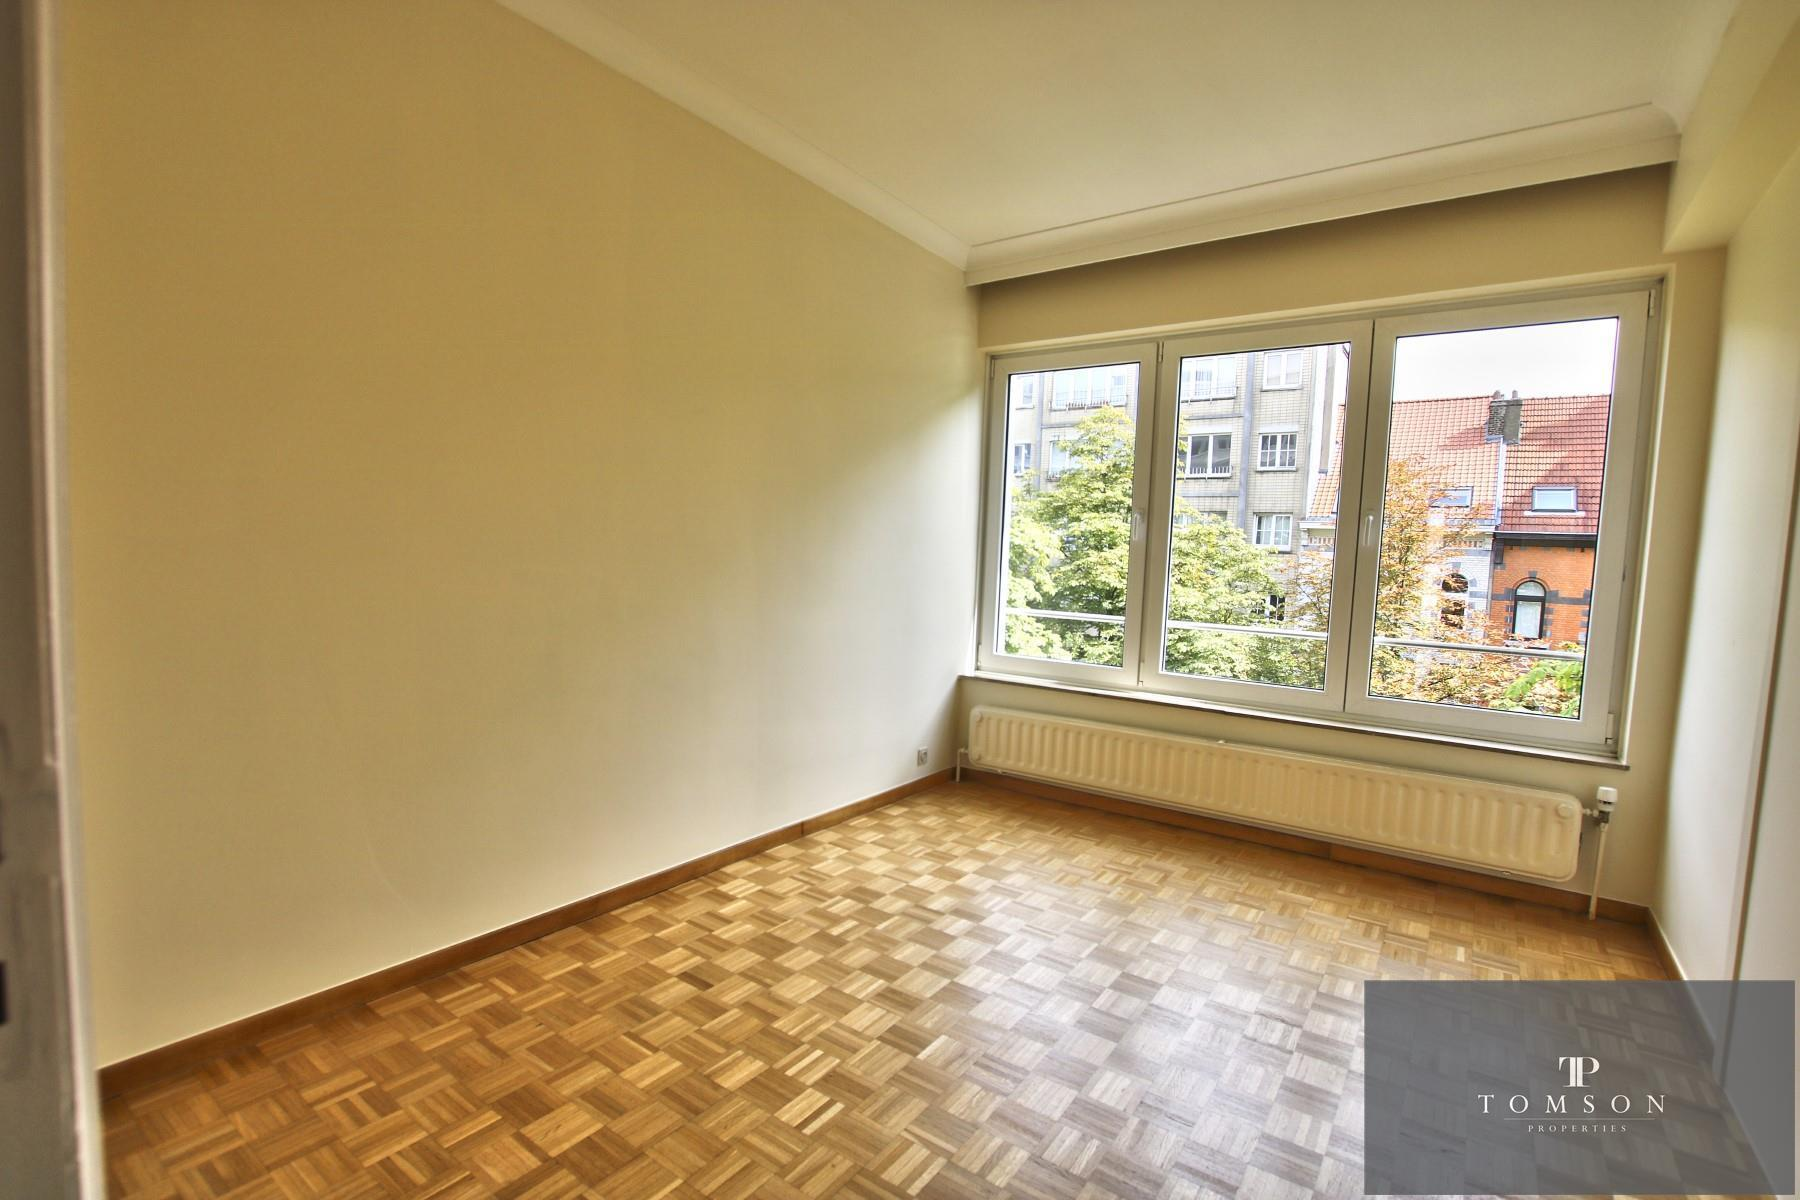 Flat - Etterbeek - #4496041-5